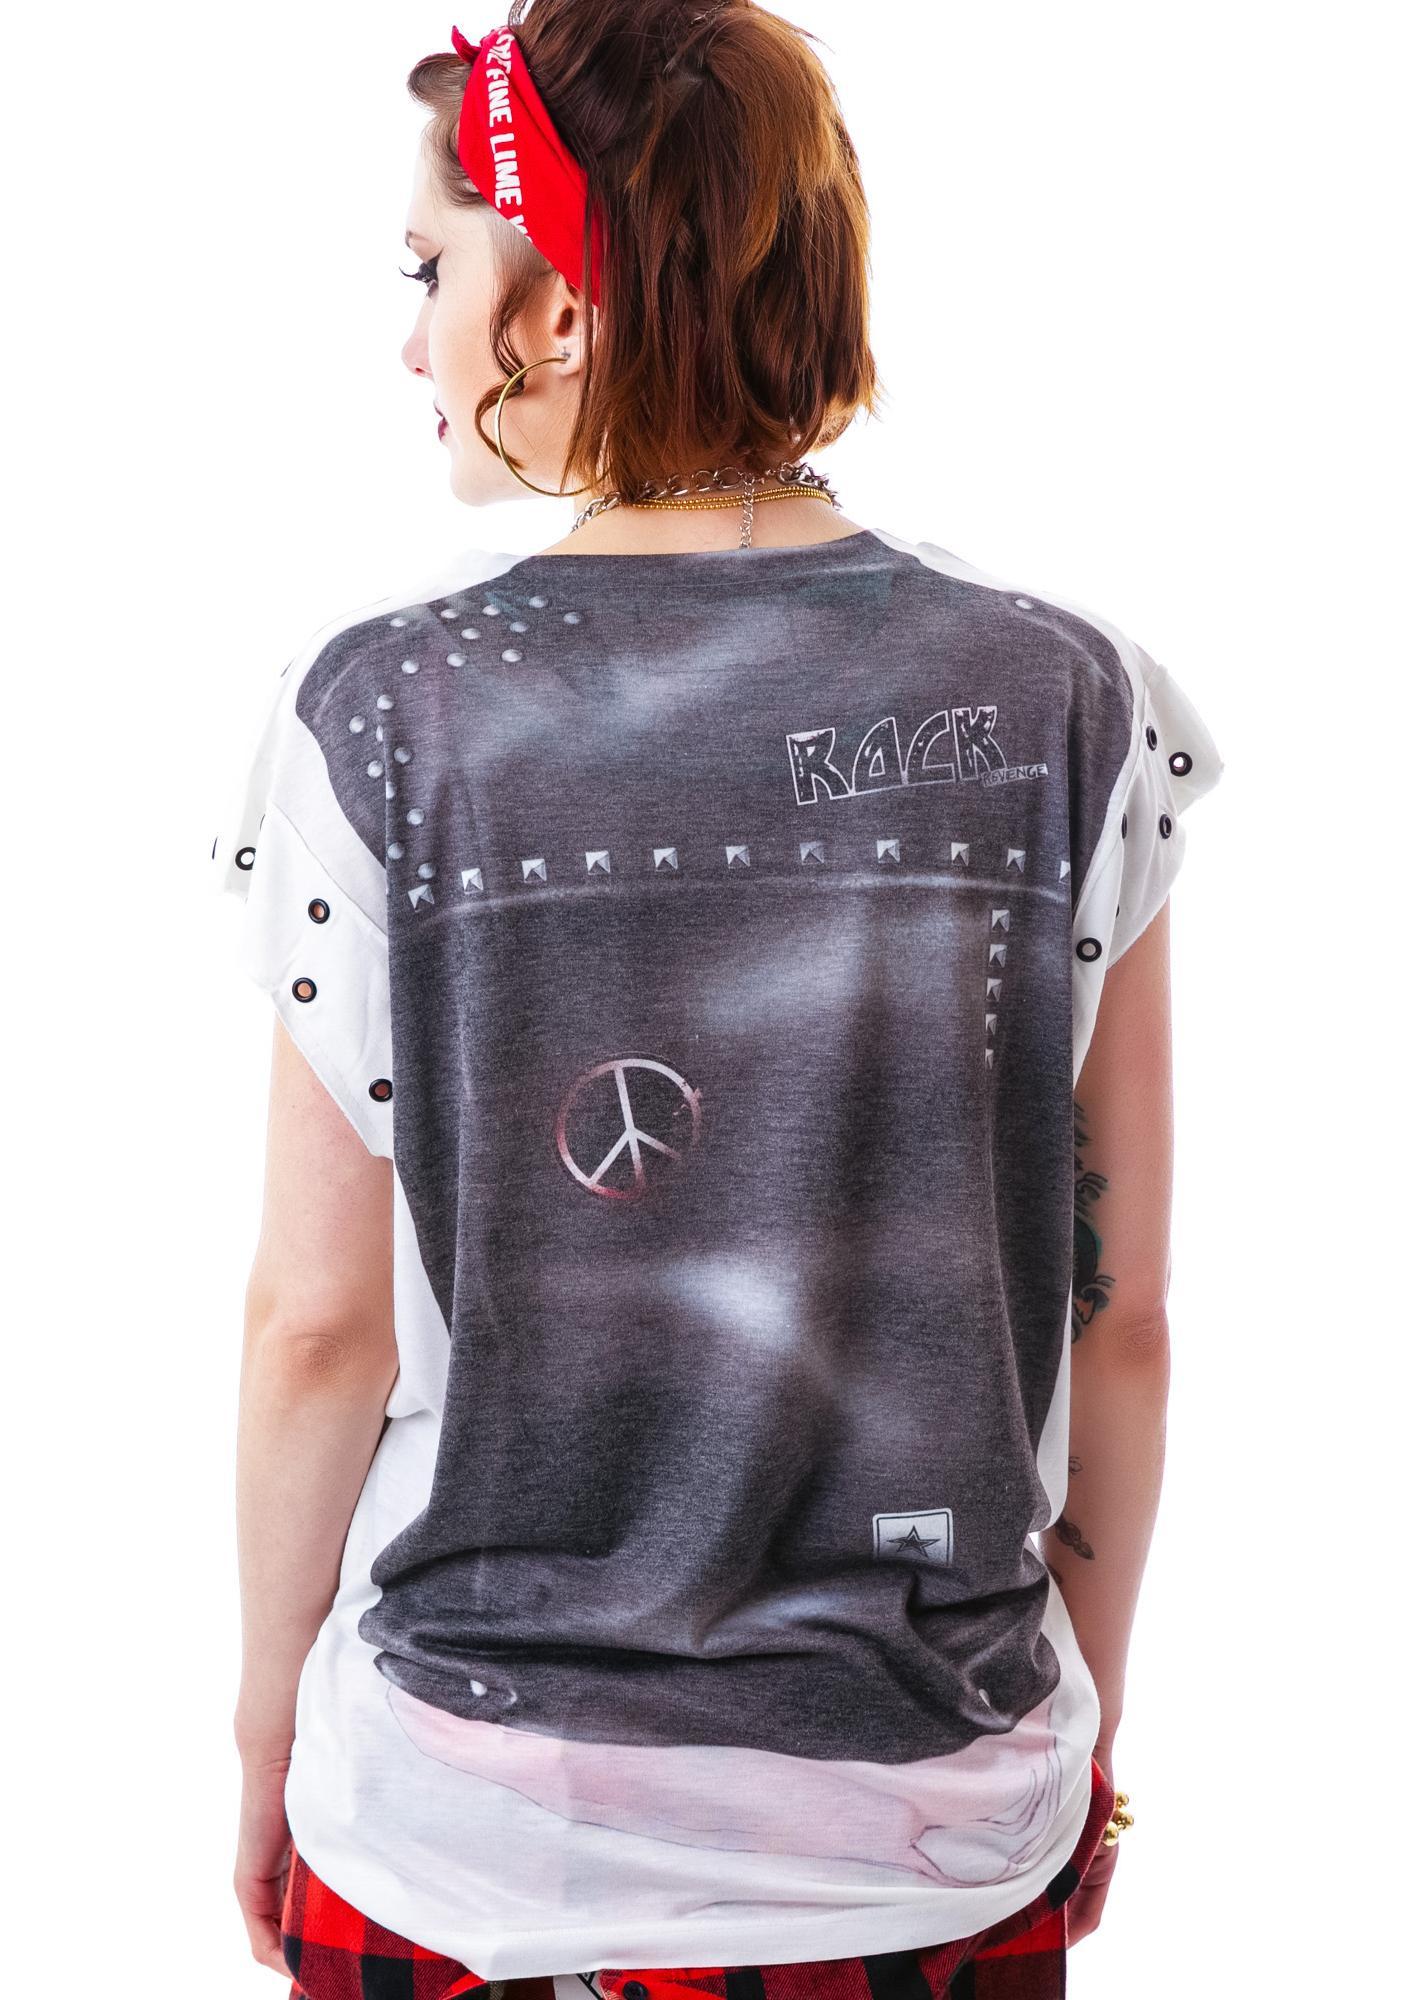 Crass Studded Moto Vest Tee